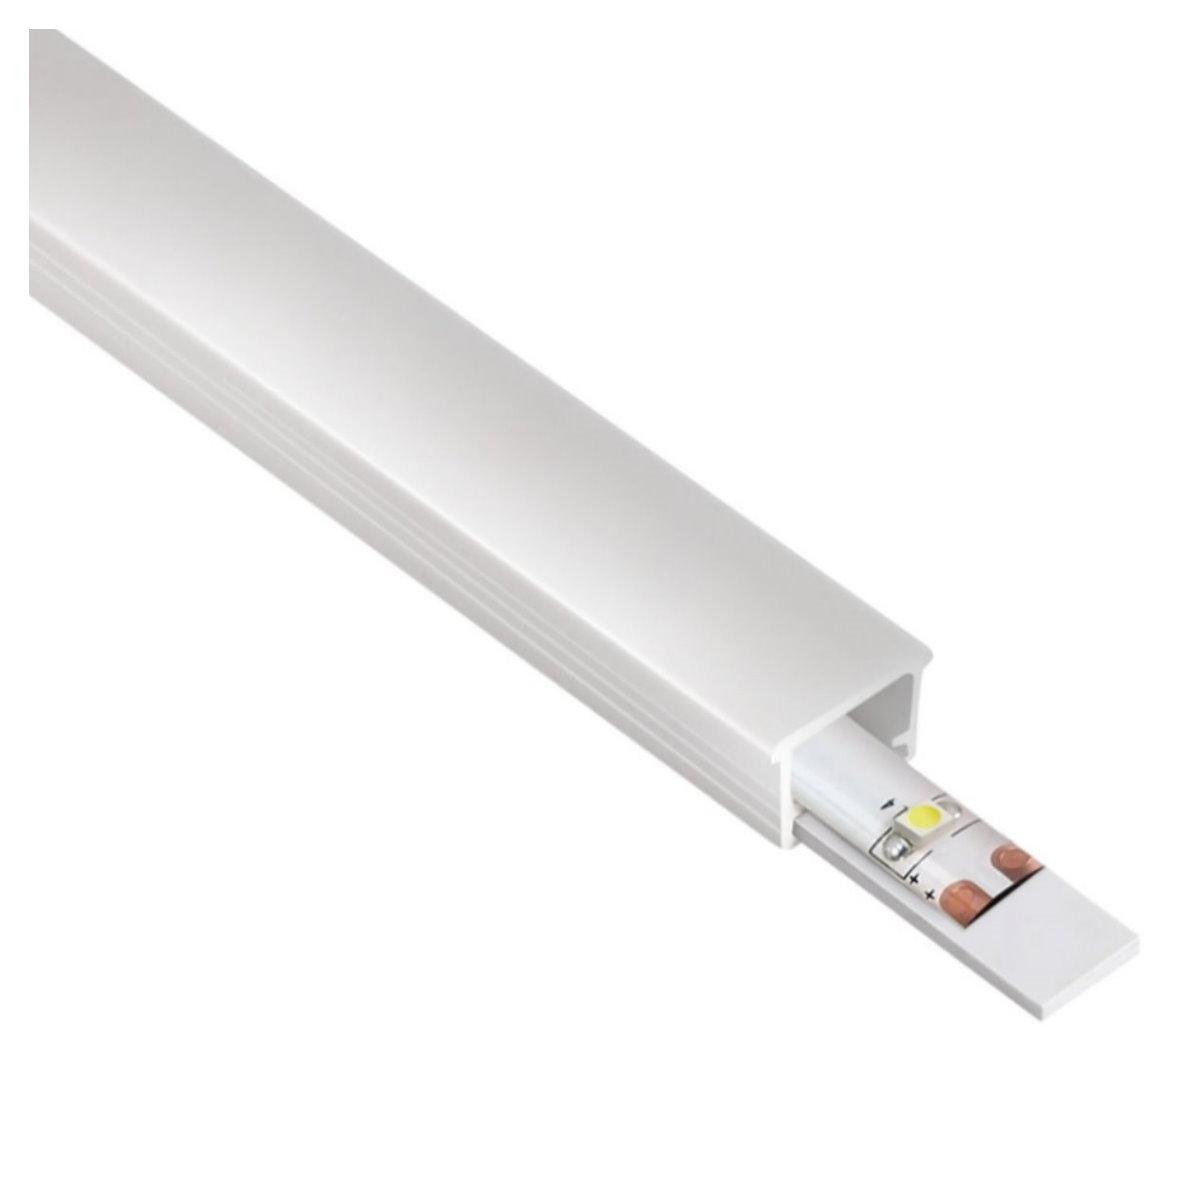 9 95 m einbau pvc profil leiste flexibel biegsam 2m opal f r led band ebay. Black Bedroom Furniture Sets. Home Design Ideas